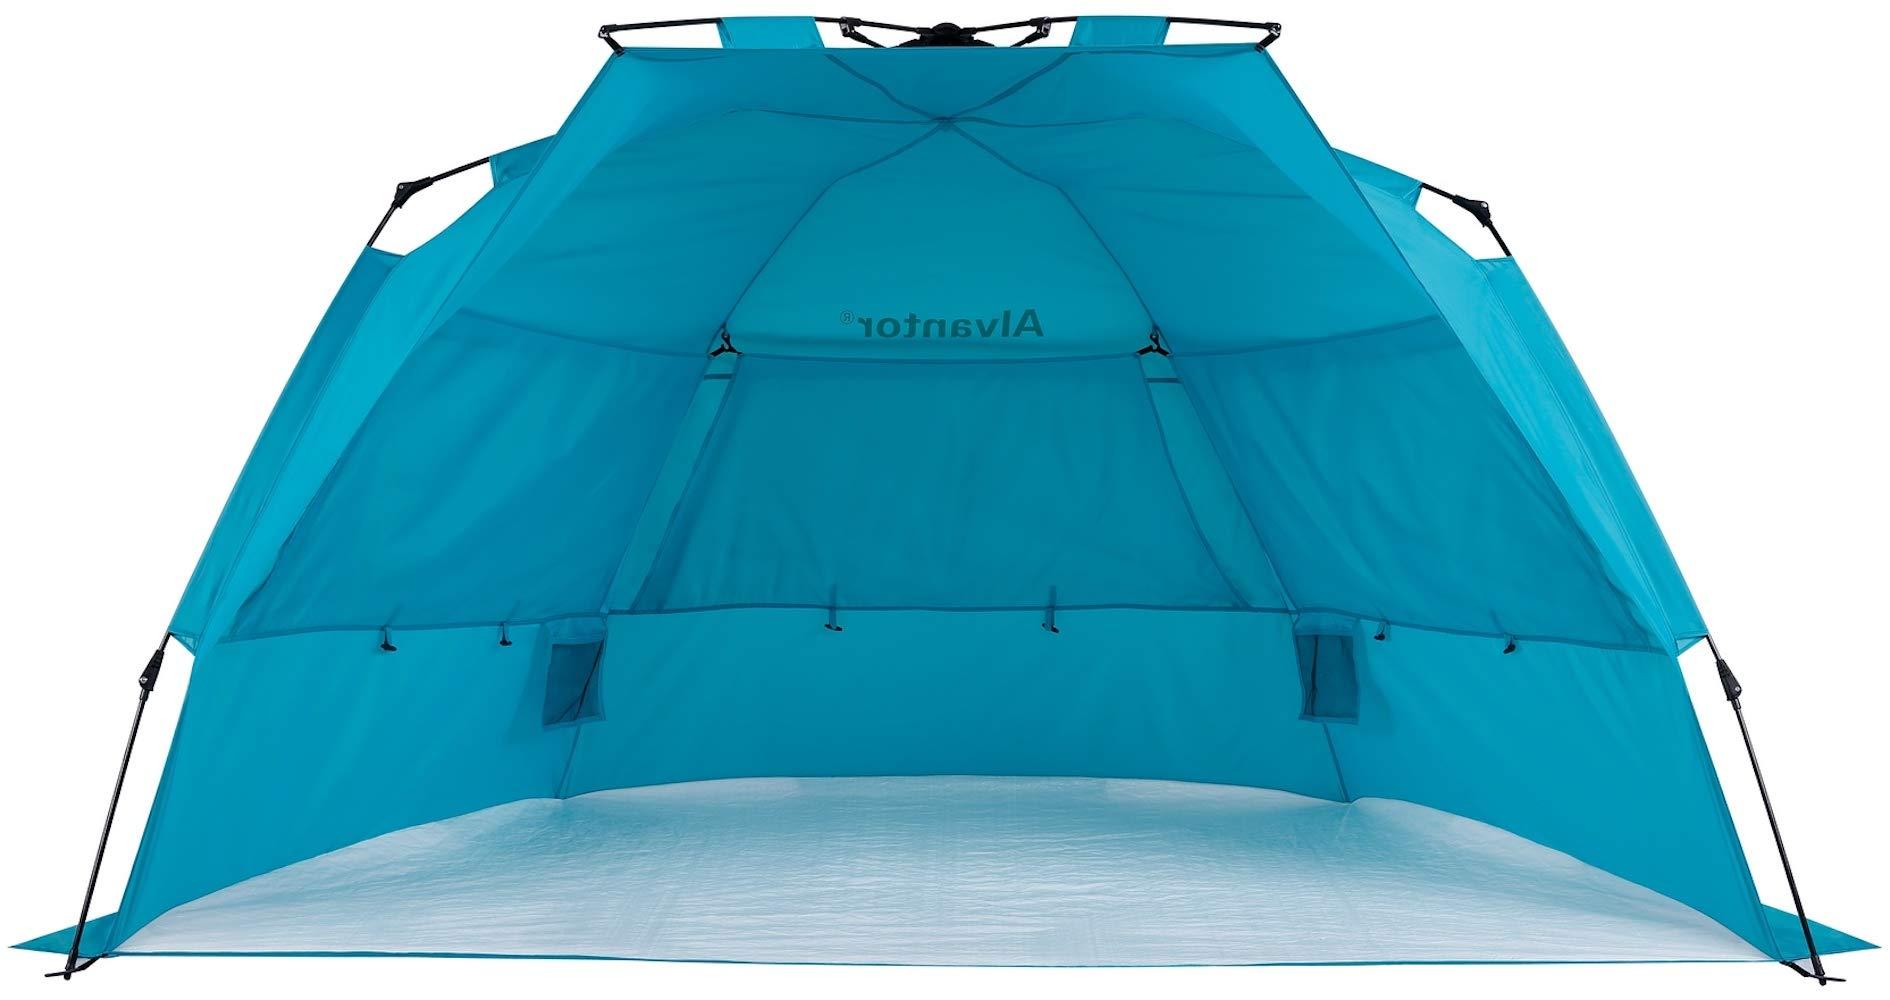 LEEDOR Super BlueCoast Beach Tents Beach Umbrella Automatic Quick Instant Pop-Up Patent Pending Hub Anti-UV Sun Shade Tent Portable Outdoor Sun Shelter Cabana 3-4 Person Camping, Fishing, Hiking